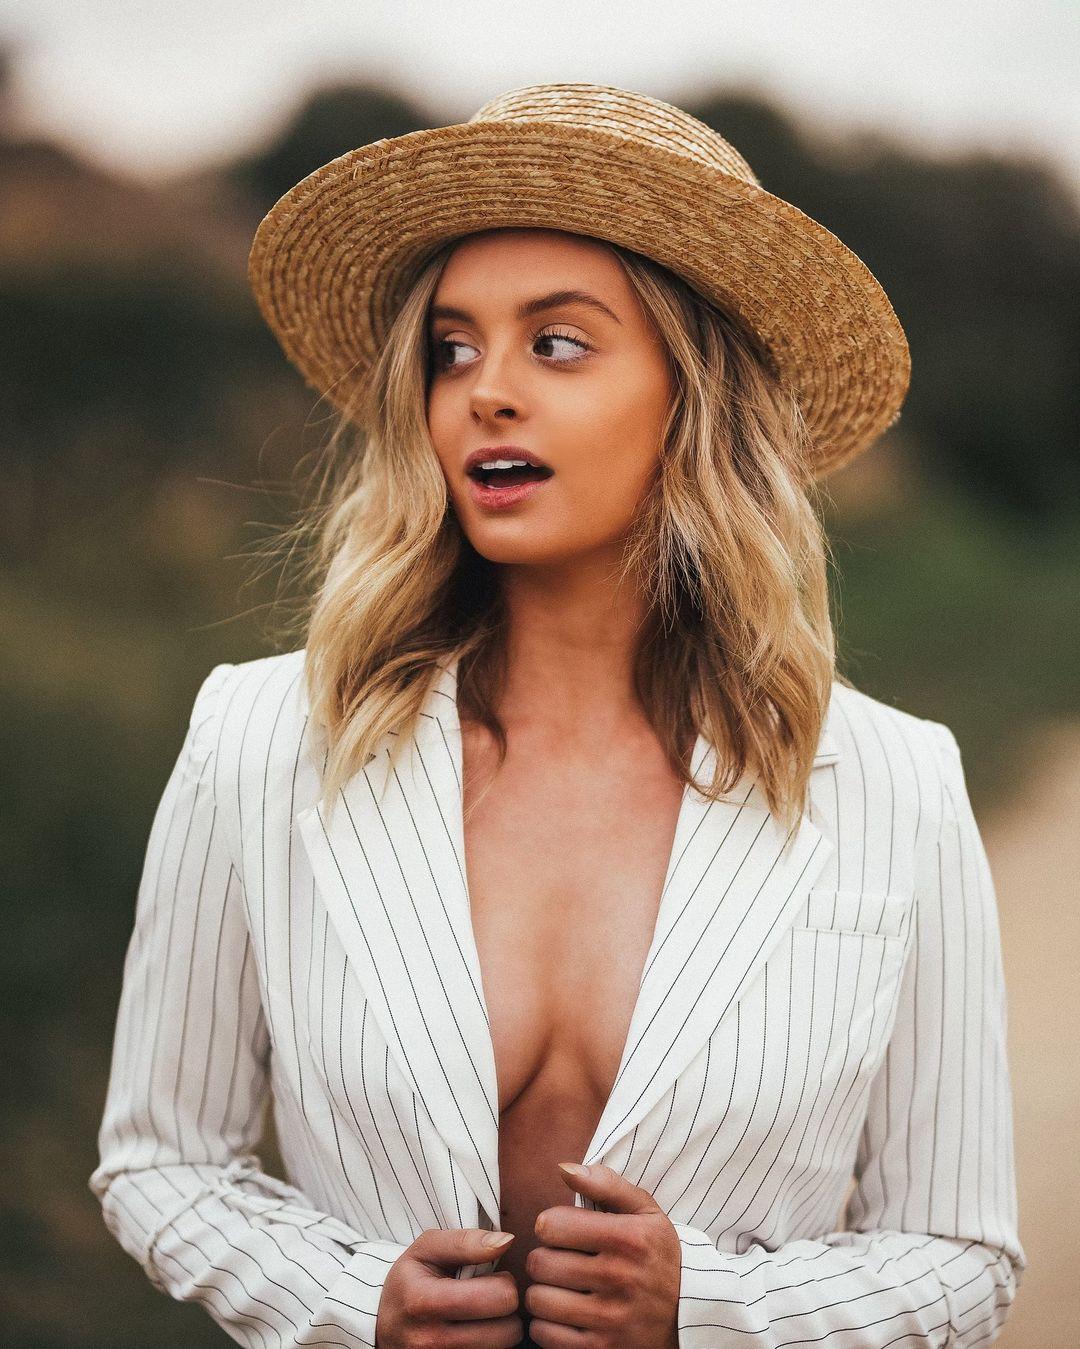 Джорджия Харрис